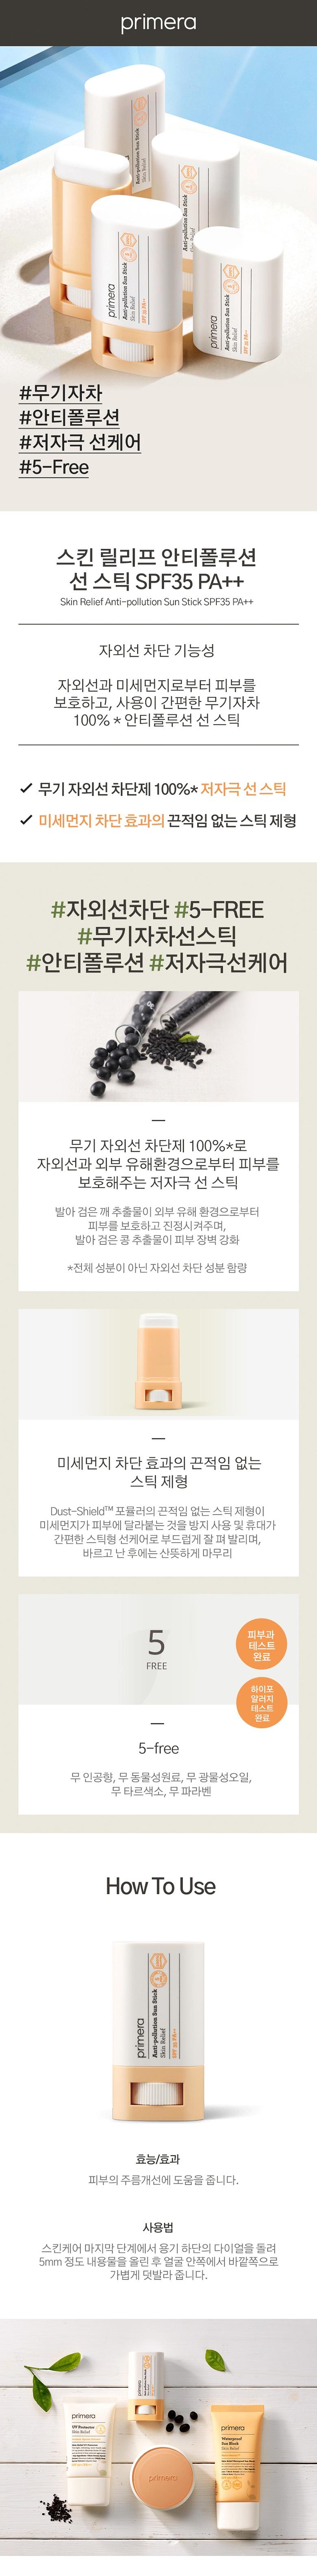 primera Skin Relief Anti Pollution Sun Stick korean skincare product online shop malaysia macau poland1